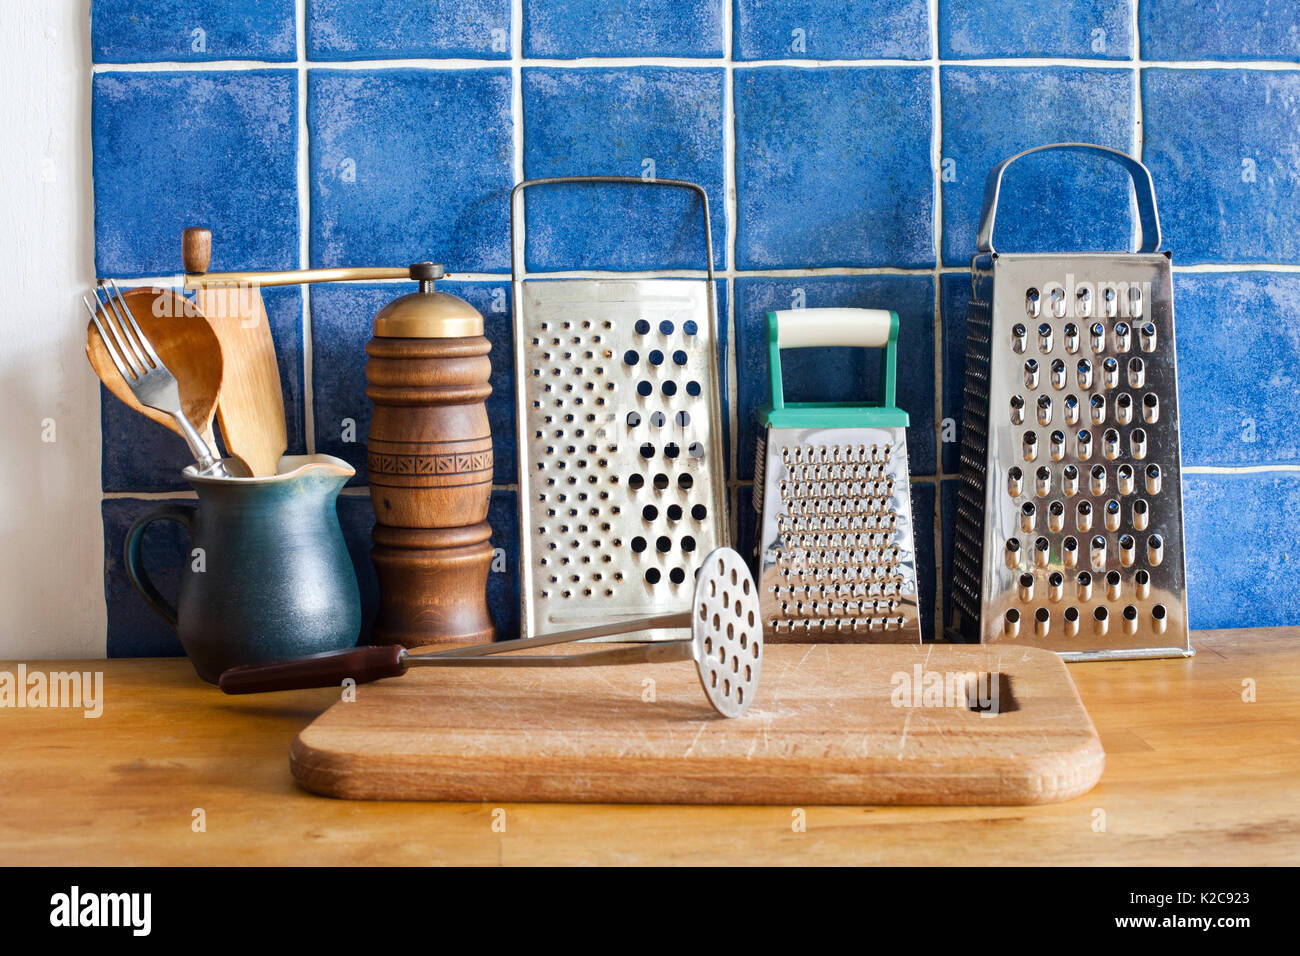 Cucina ancora in vita vintage utensili stoviglie grattugie